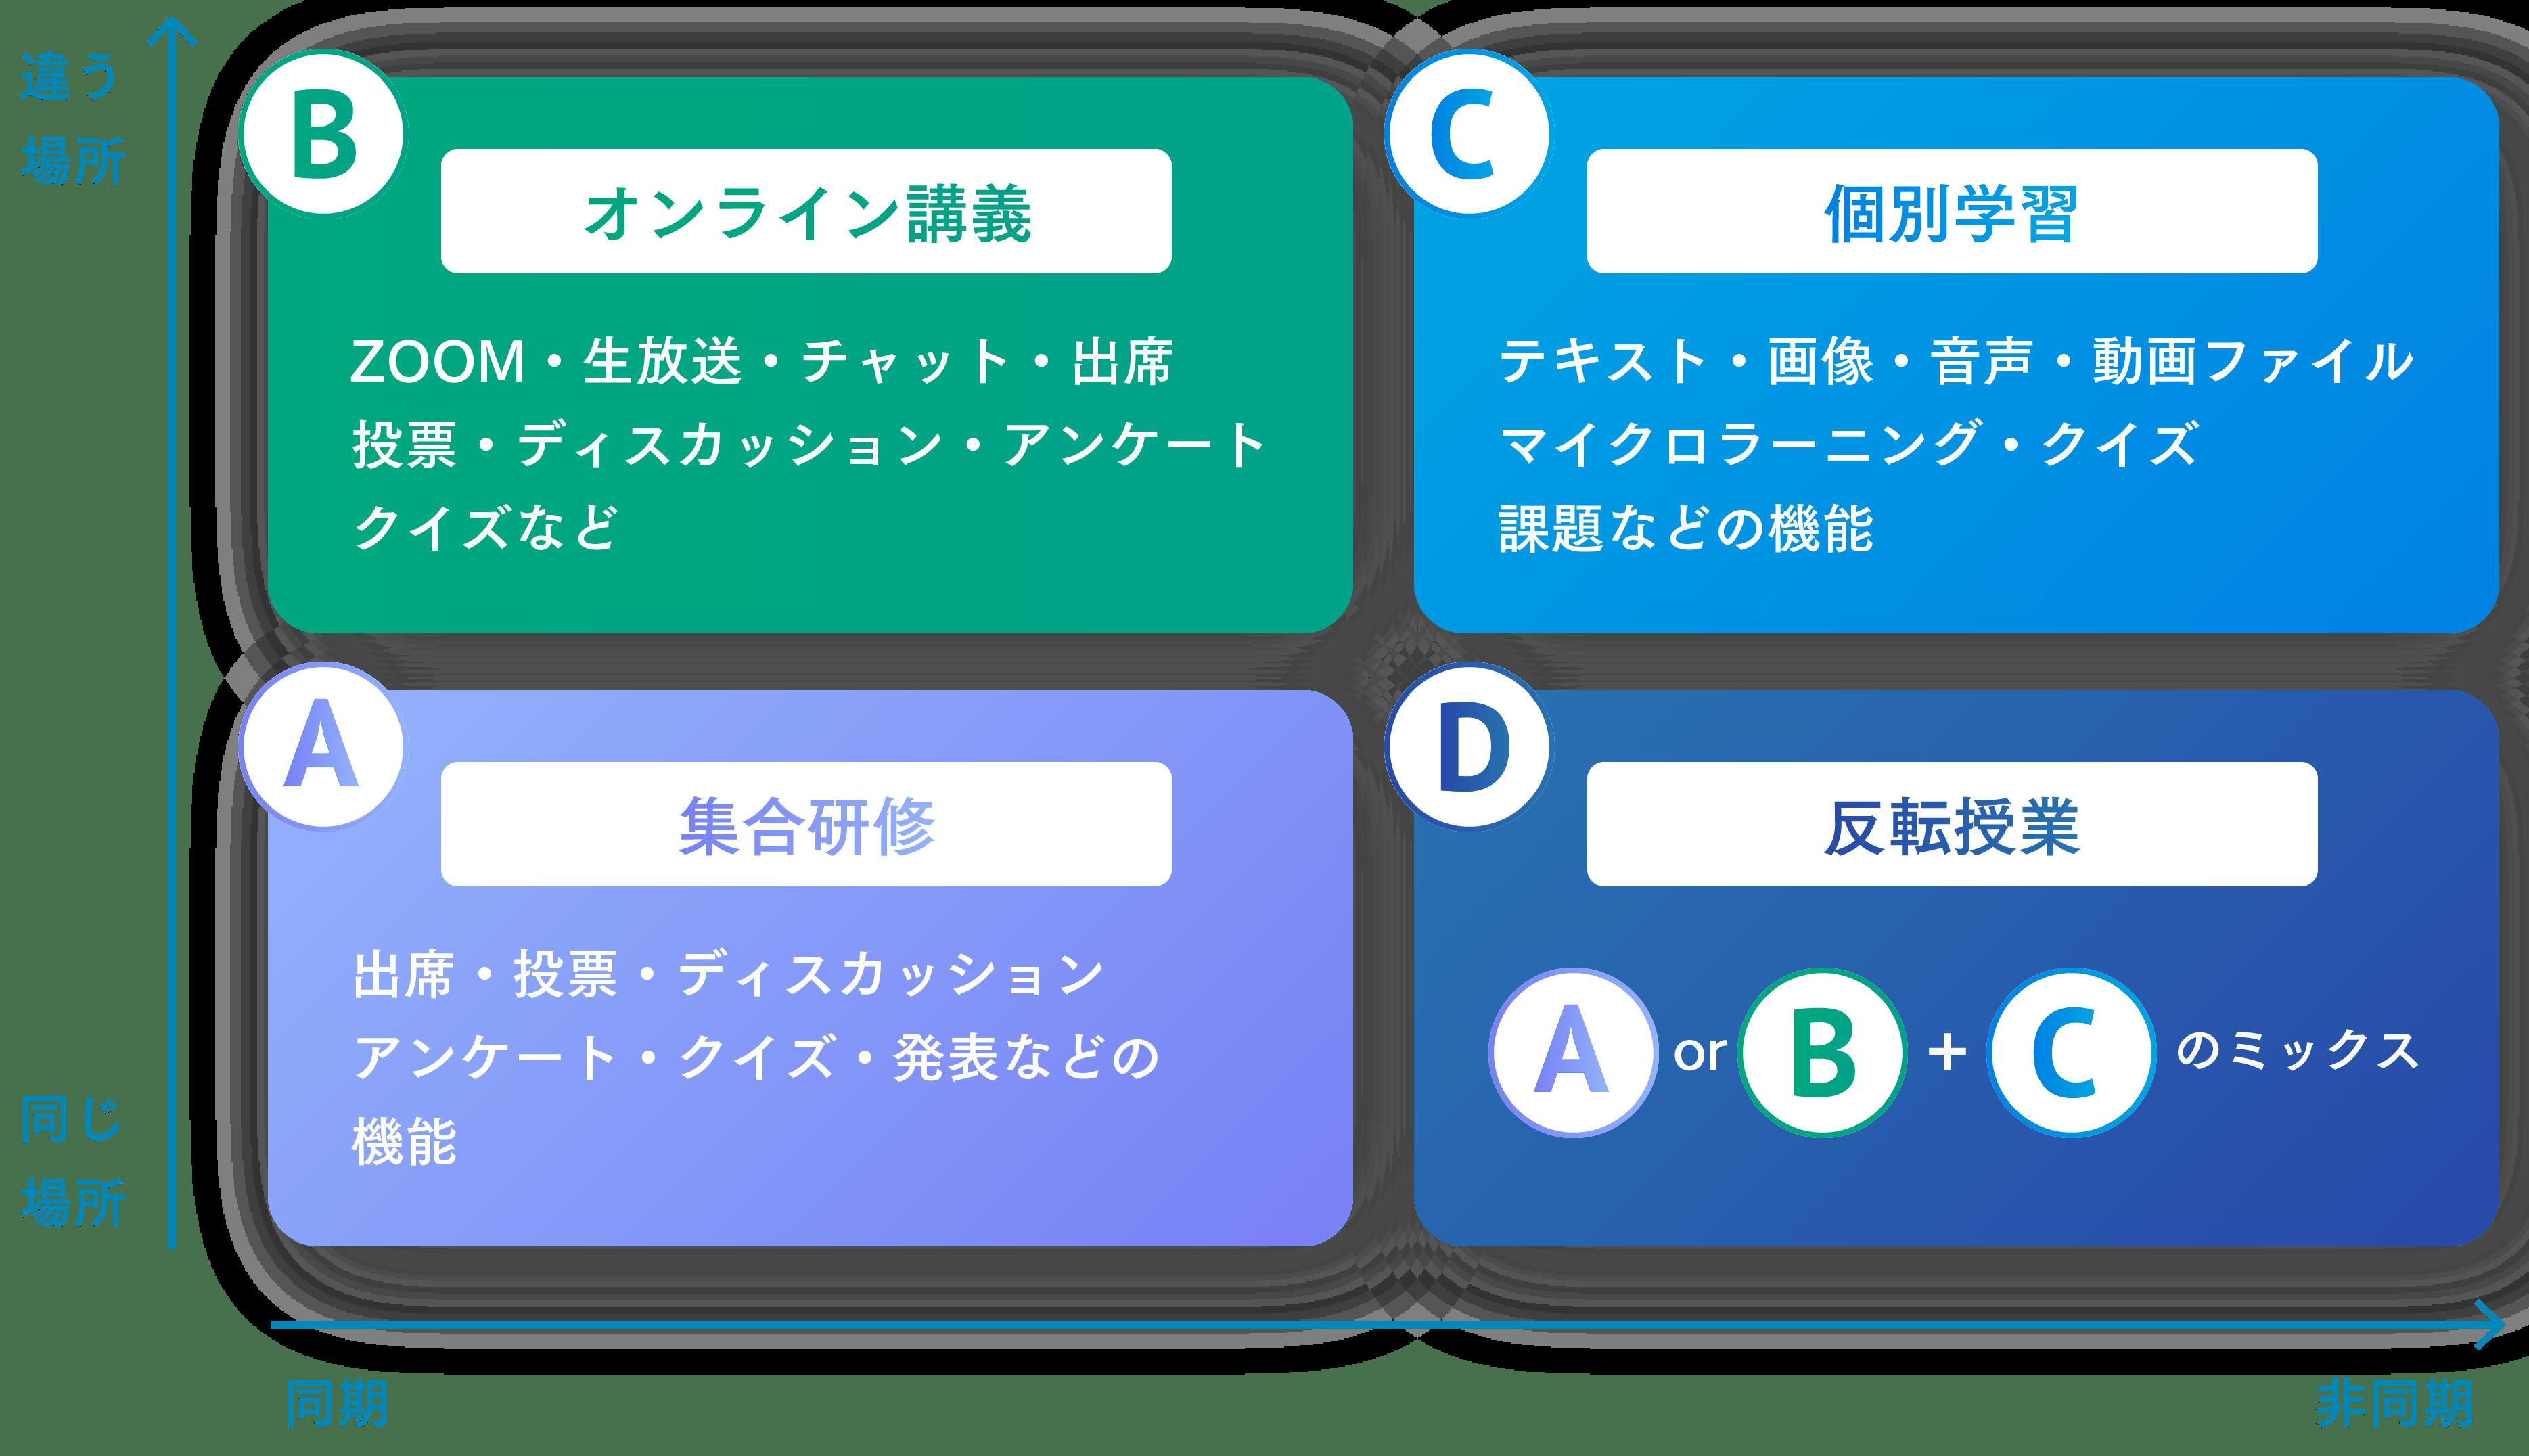 A:「集合研修」出席・投票・ディスカッション・アンケート・クイズ・発表などの機能 B:「オンライン講義」ZOOM・生放送・チャット・出席・投票・ディスカッション・アンケート・クイズなど C:「個別学習」テキスト・画像・音声・動画ファイル・マイクロラーニング・クイズ・課題などの機能 D:「反転授業」AあるいはBとCのミックス